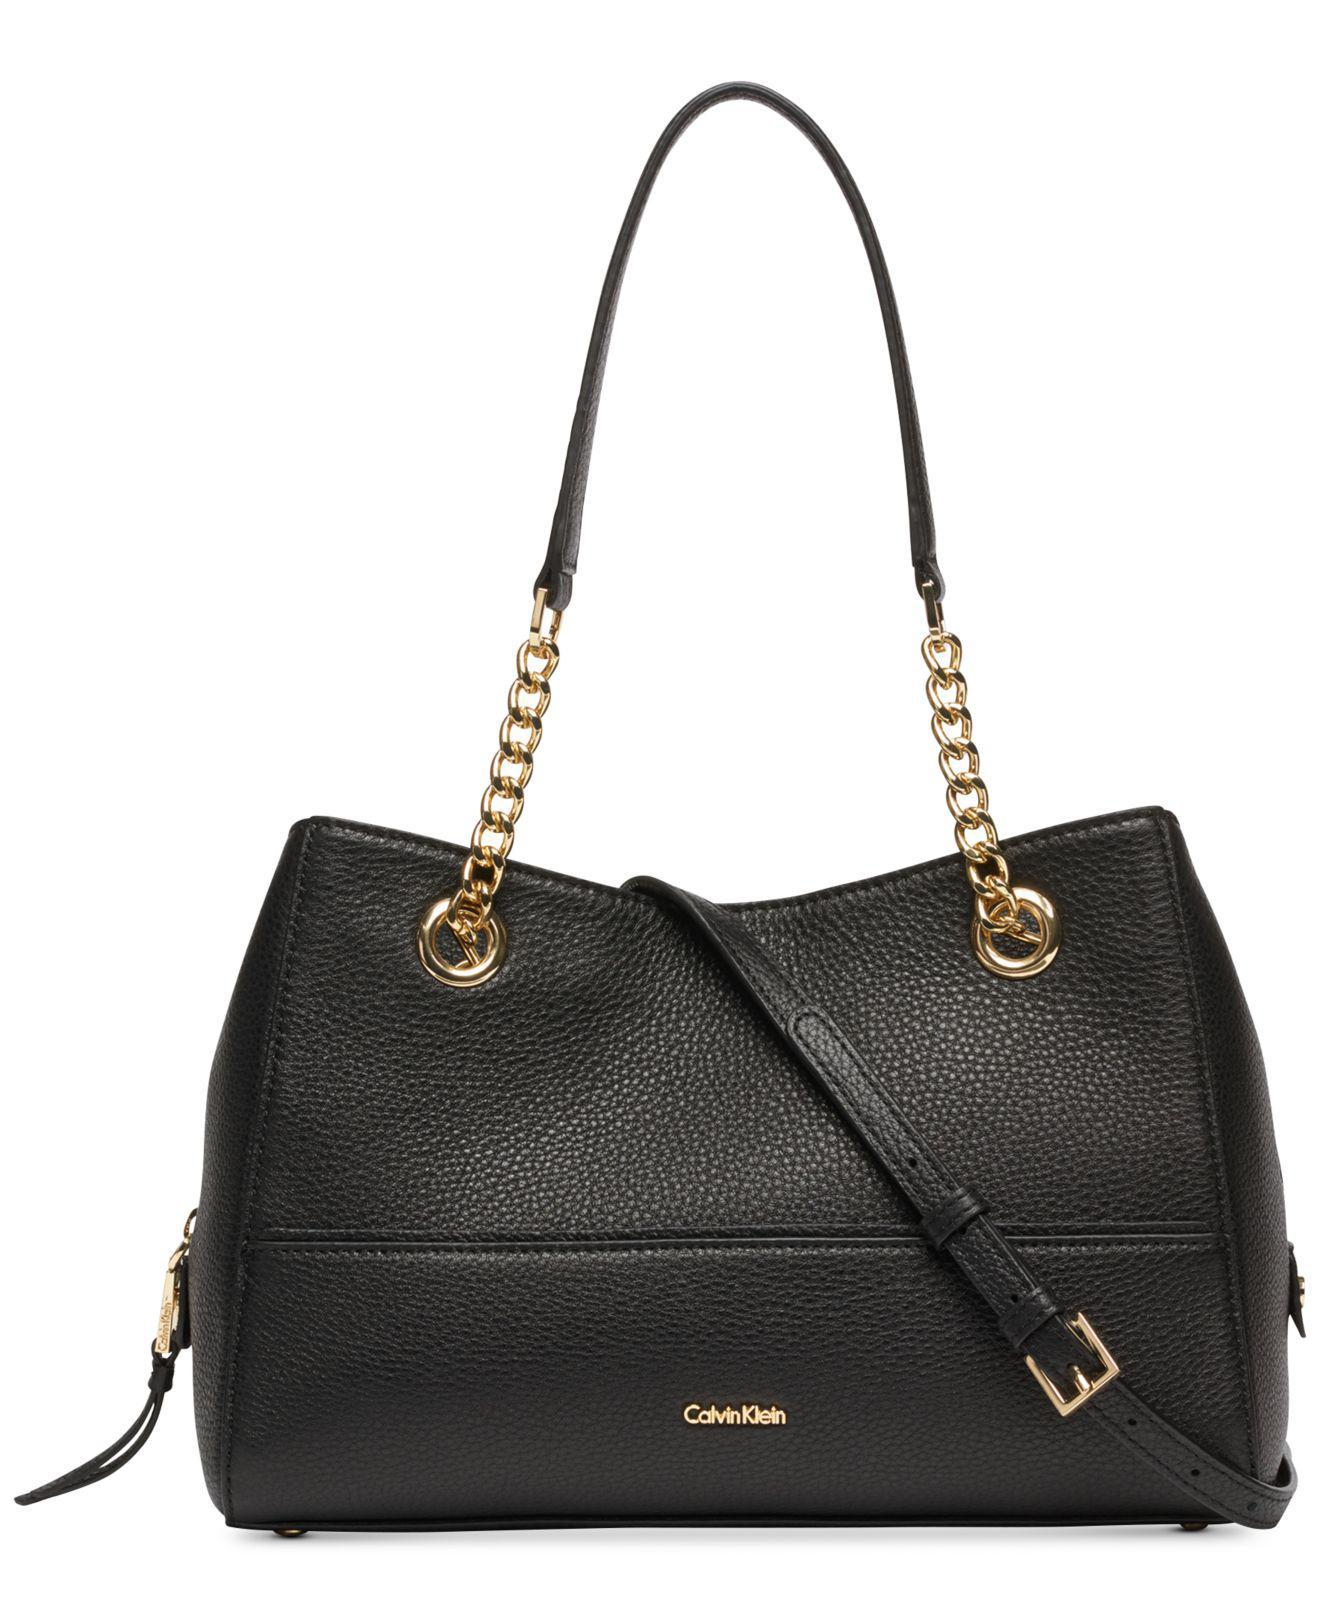 e7e4ef53e9b Calvin Klein Marie Leather Satchel in Black - Lyst